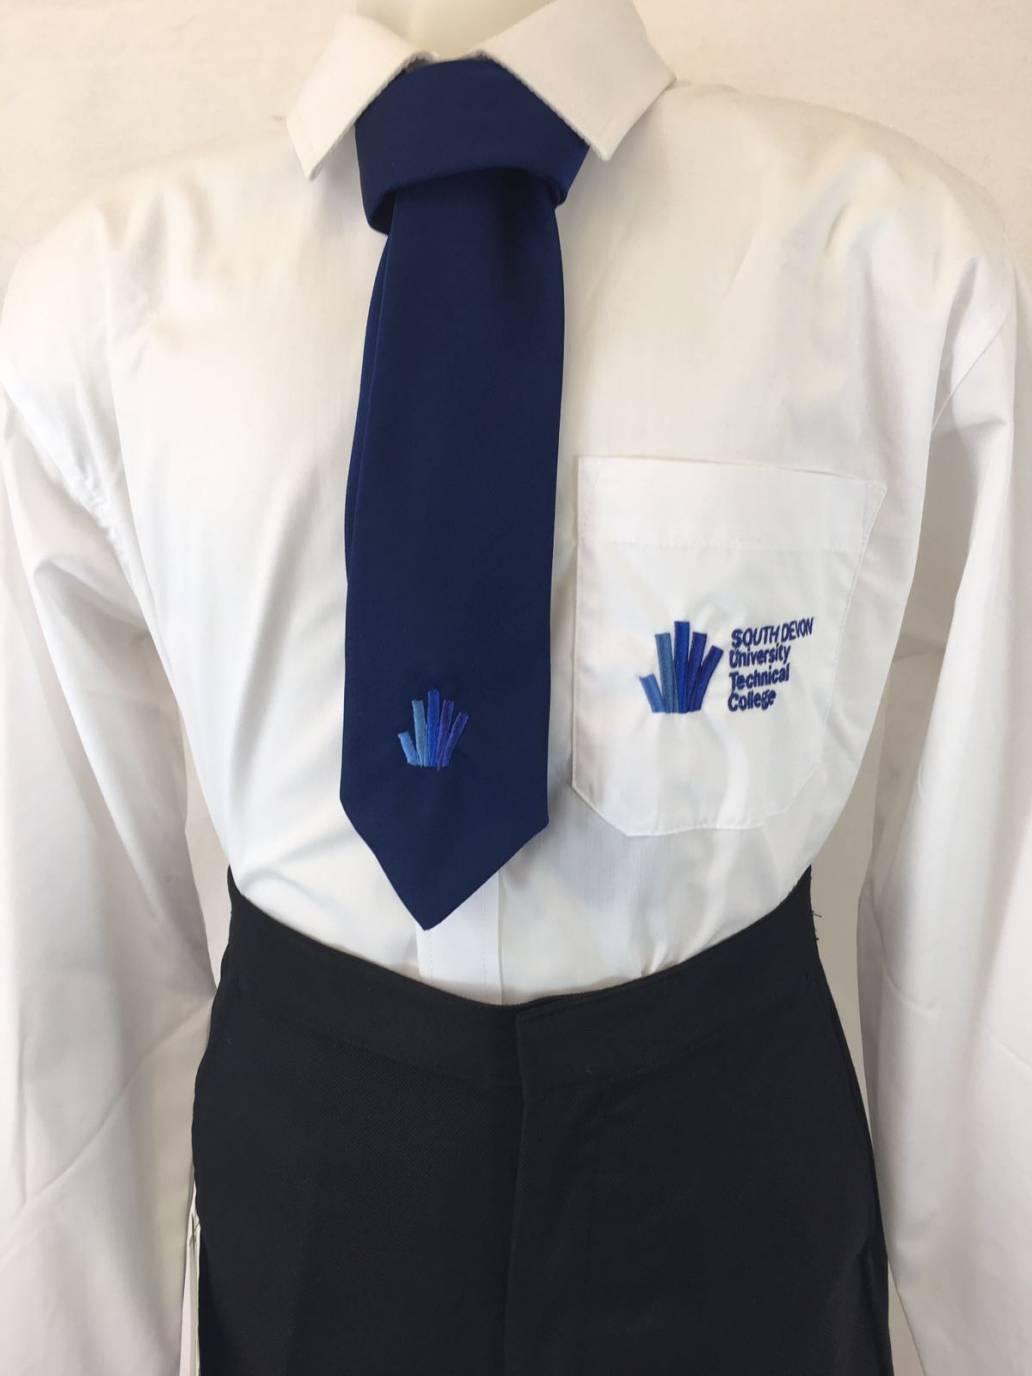 South Devon UTC Long Sleeve Shirt